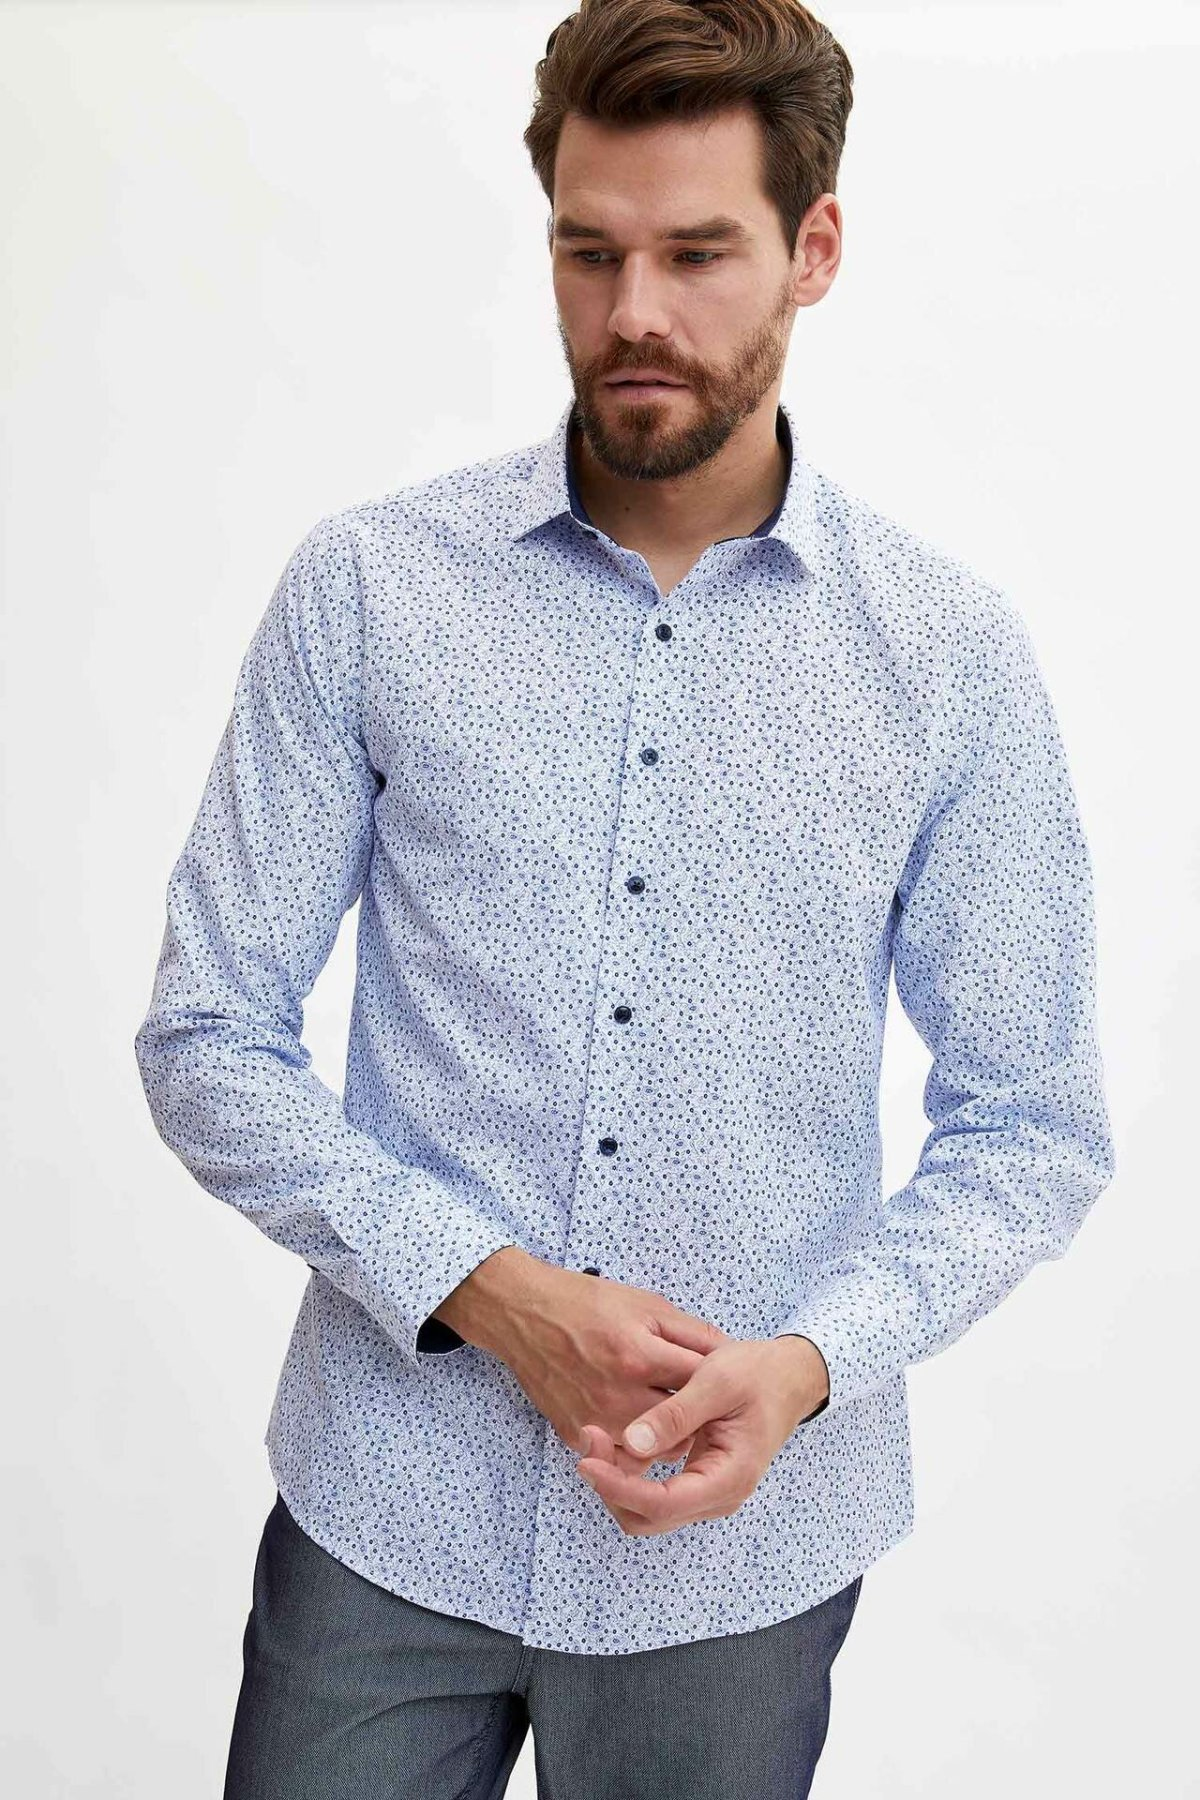 DeFacto Men Fashion Print Pattern Shirts Long Sleeve Shirts Mens Casual Lapel Collar Casual Shirt Tops New - L5901AZ19AU